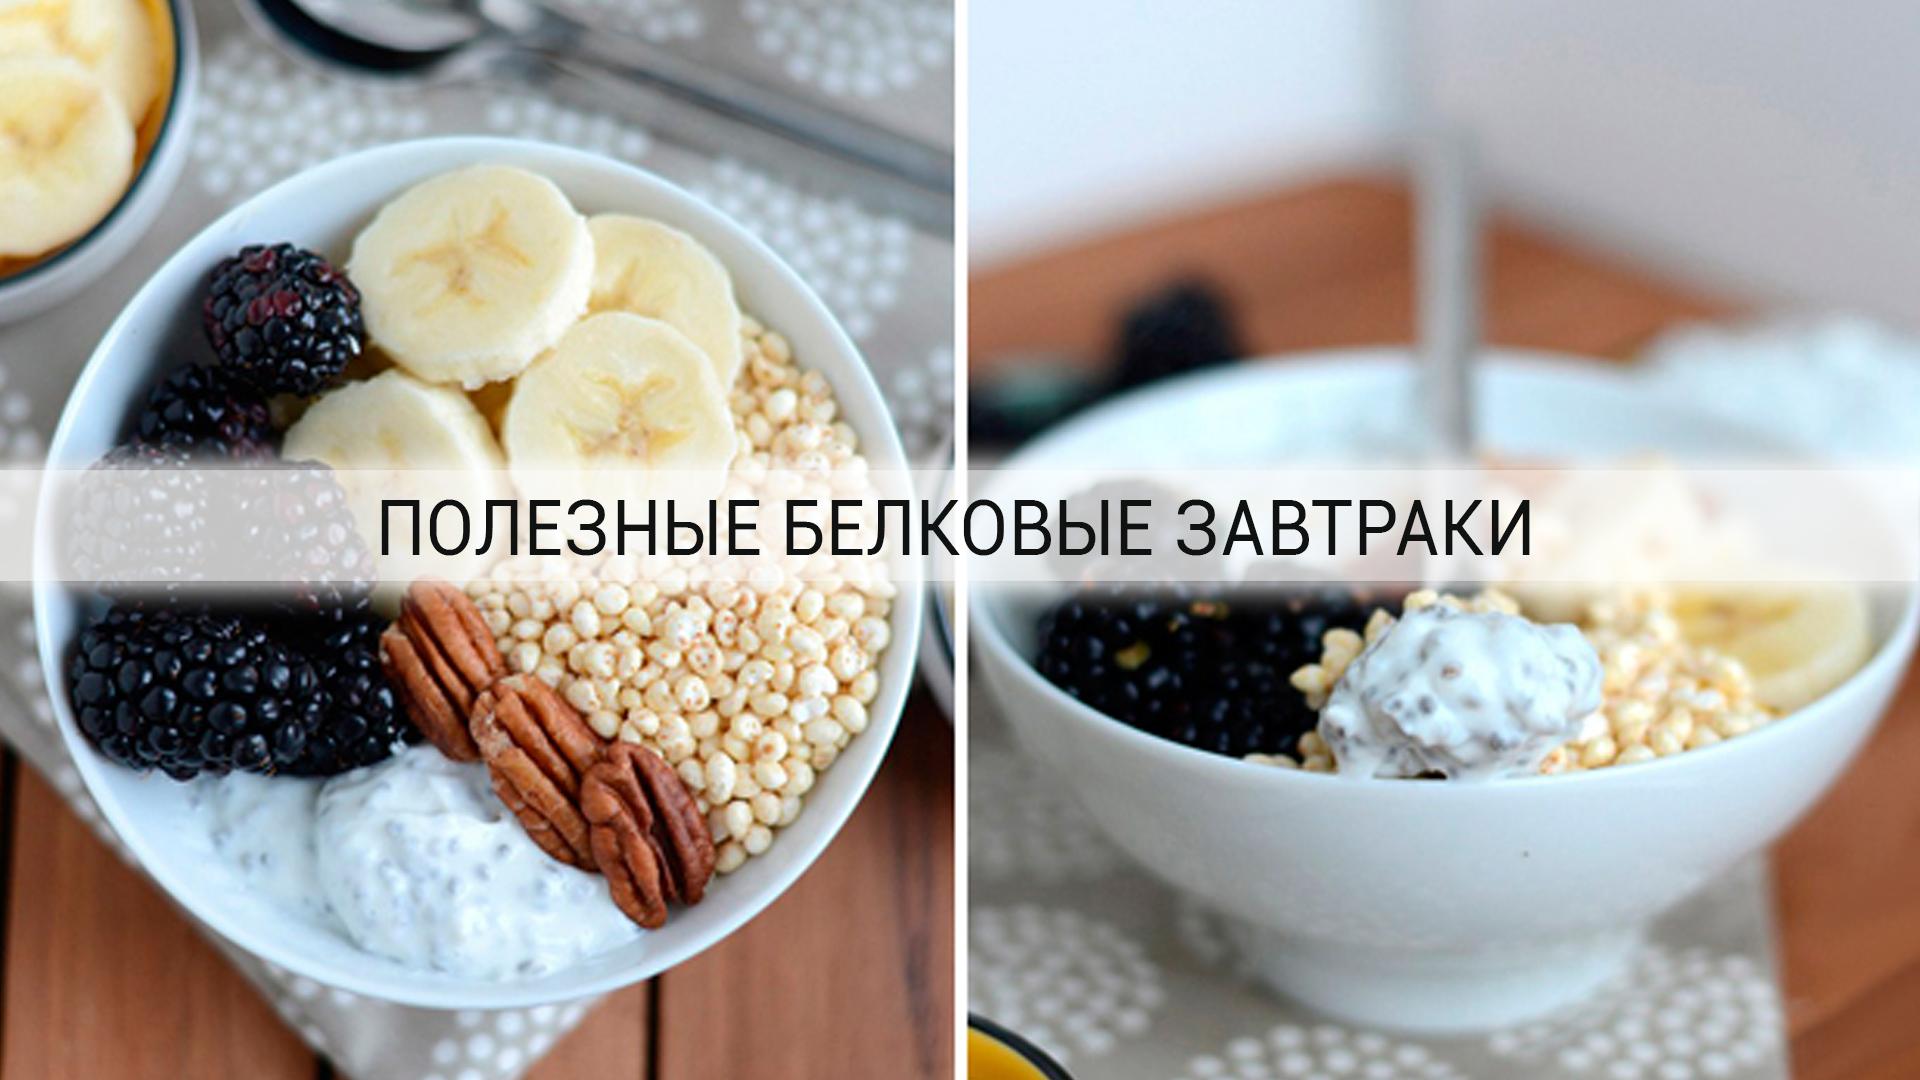 Рецепт фитнес завтрака